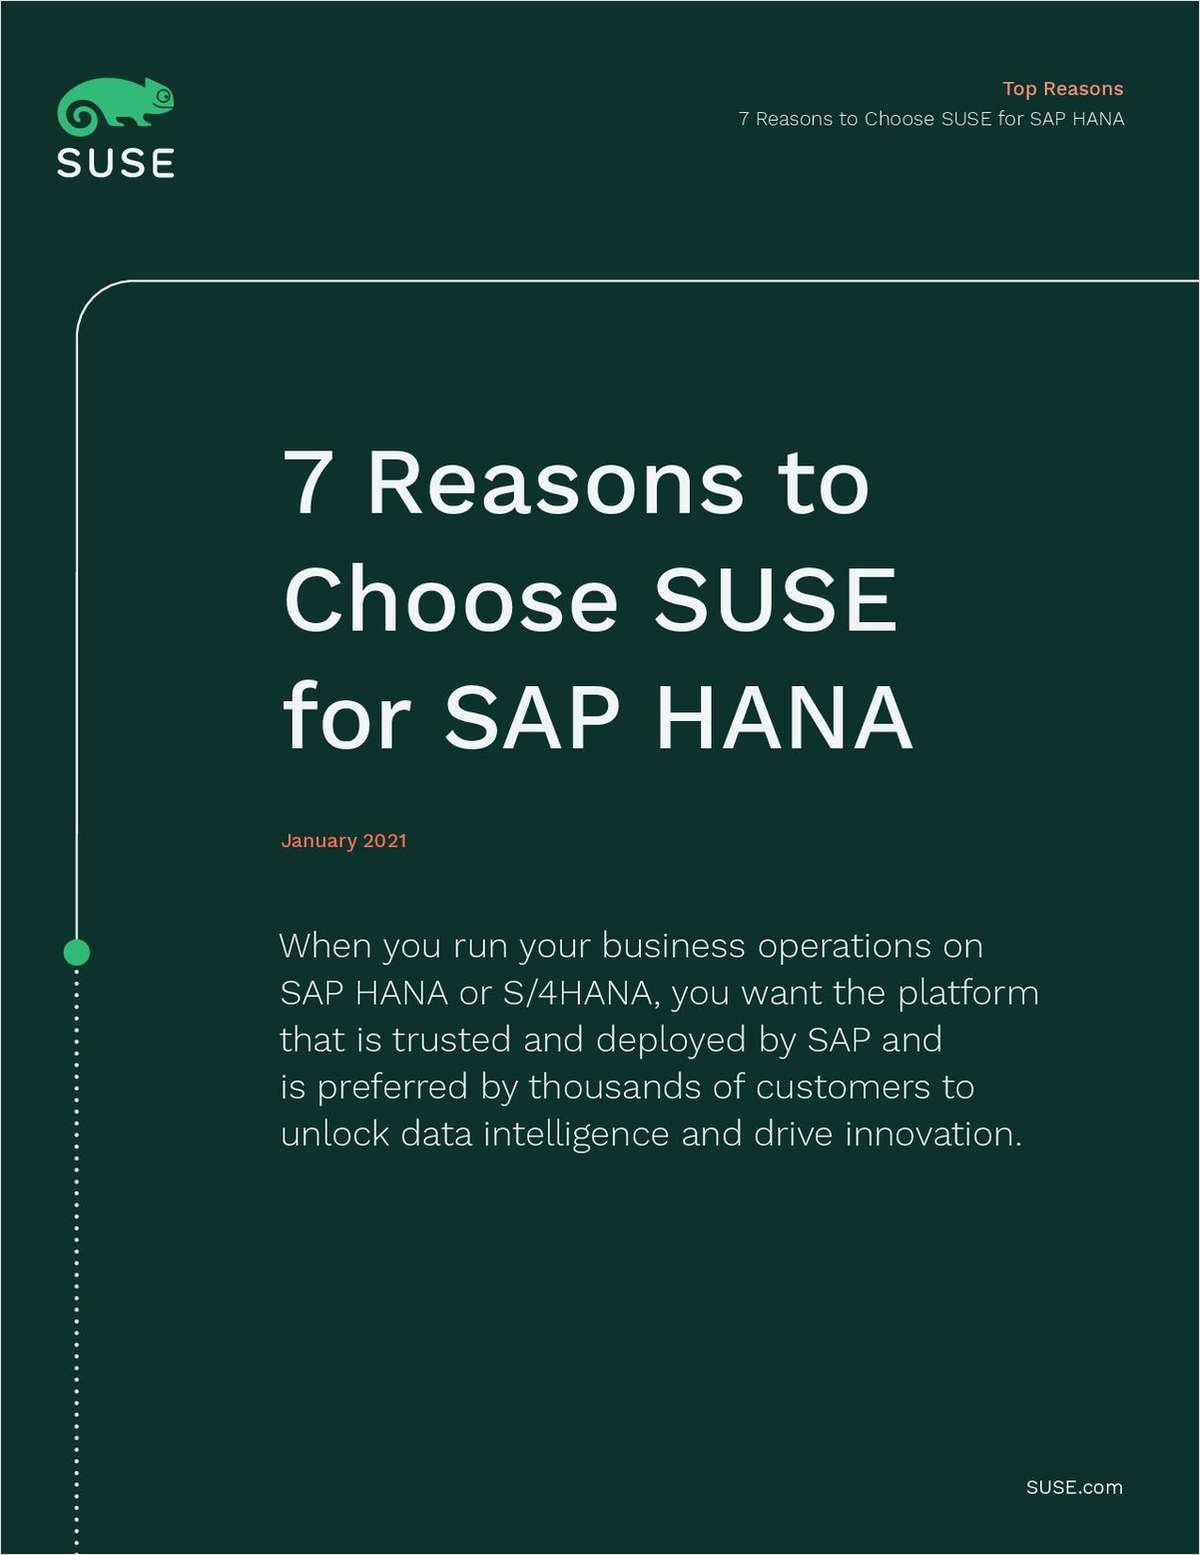 7 Reasons to Choose SUSE for SAP HANA